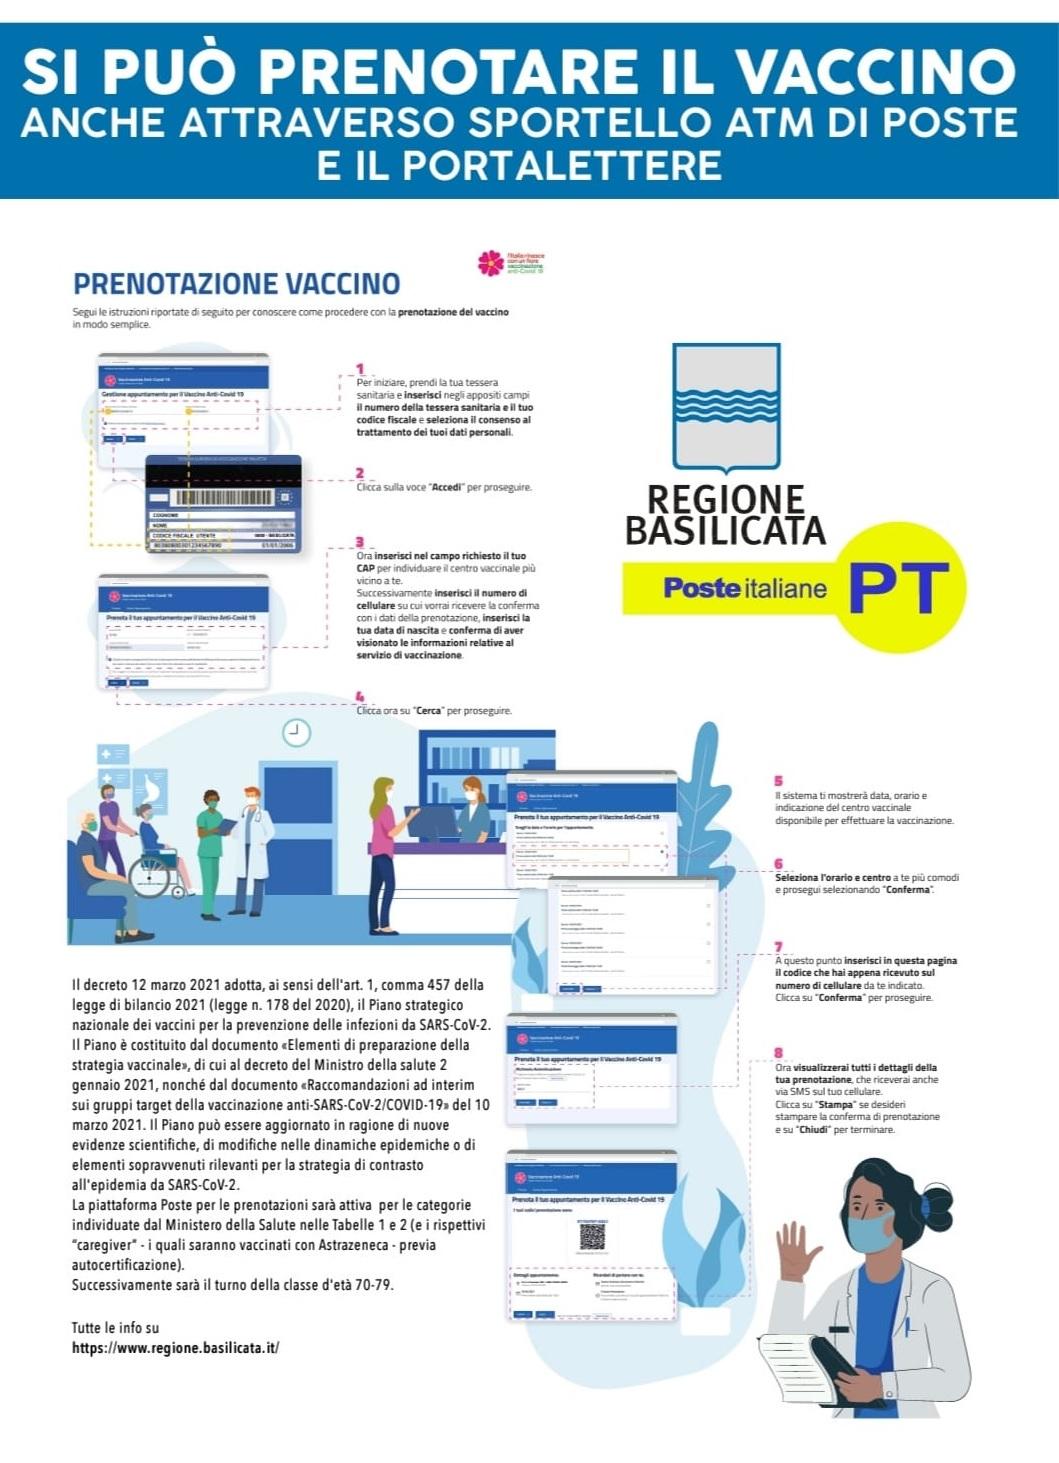 Scelta/revoca medico on-line